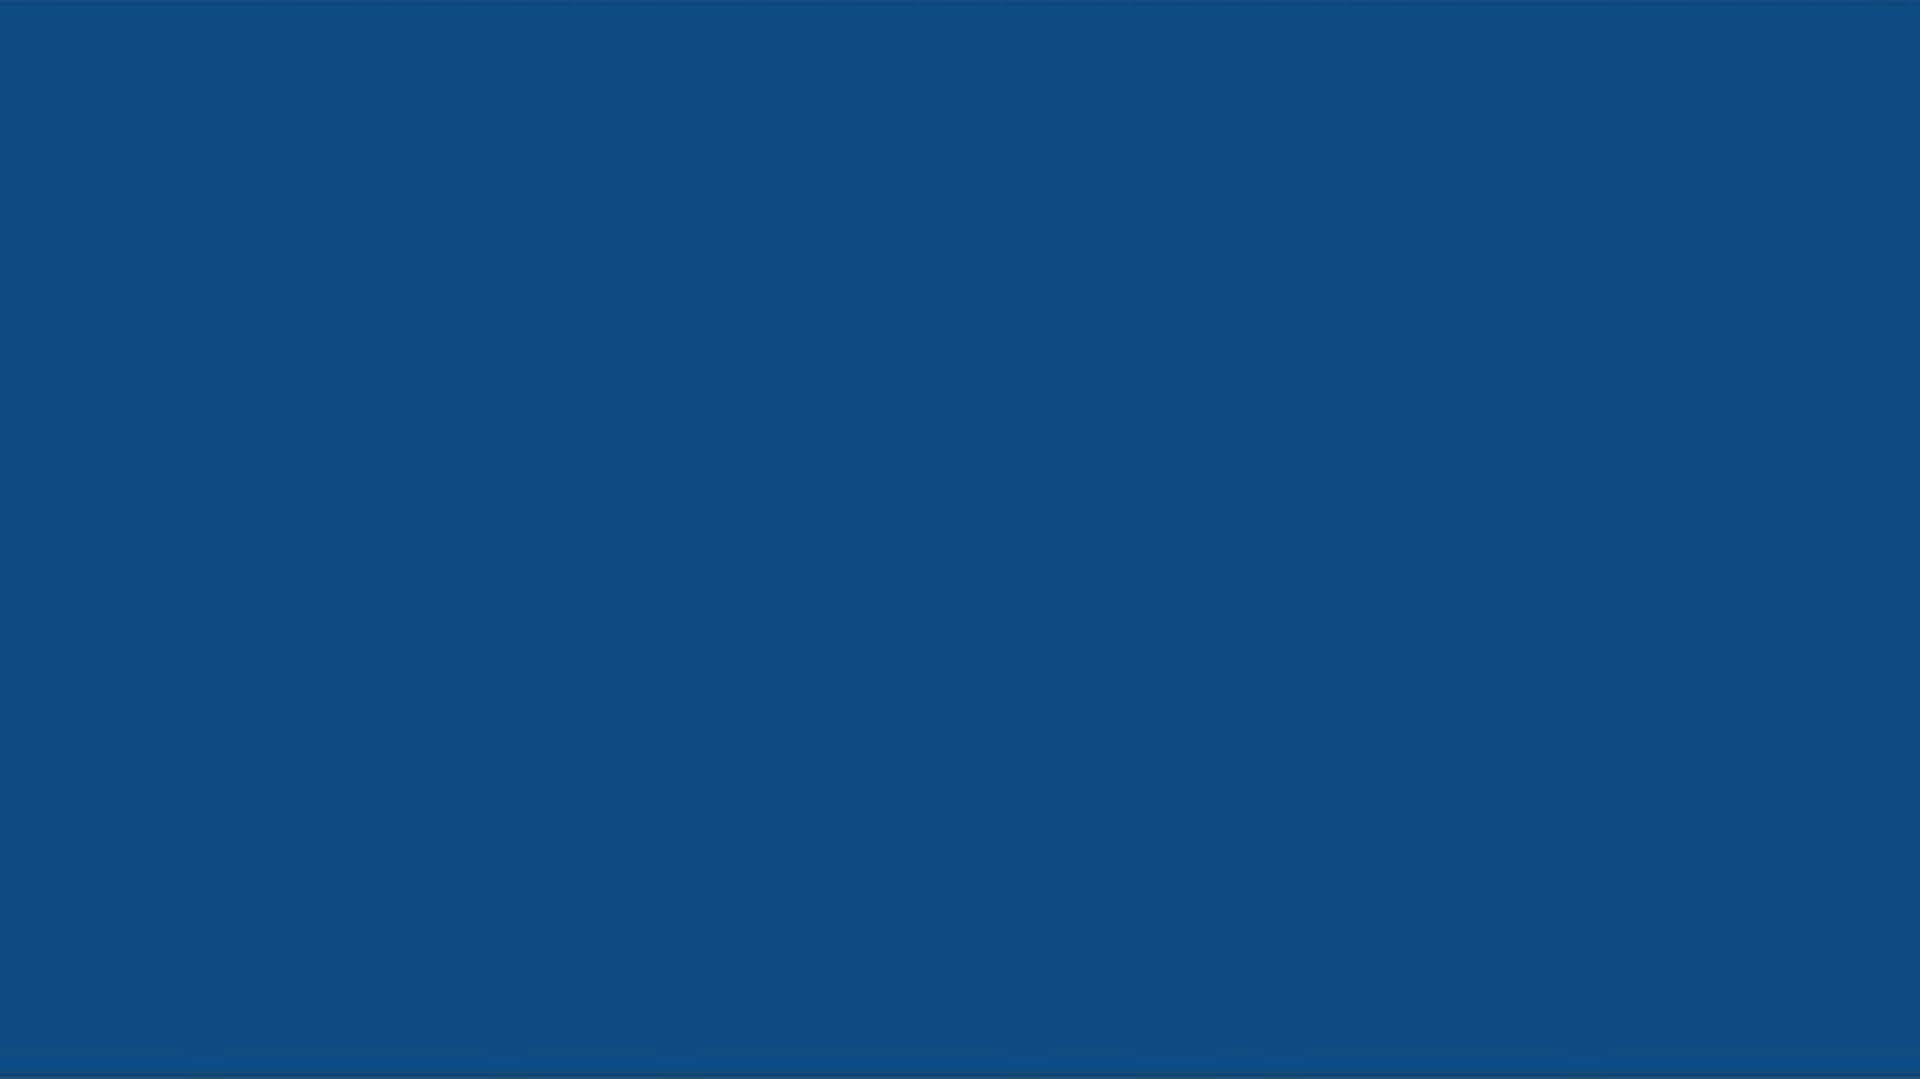 Classic Blue Is Pantone's